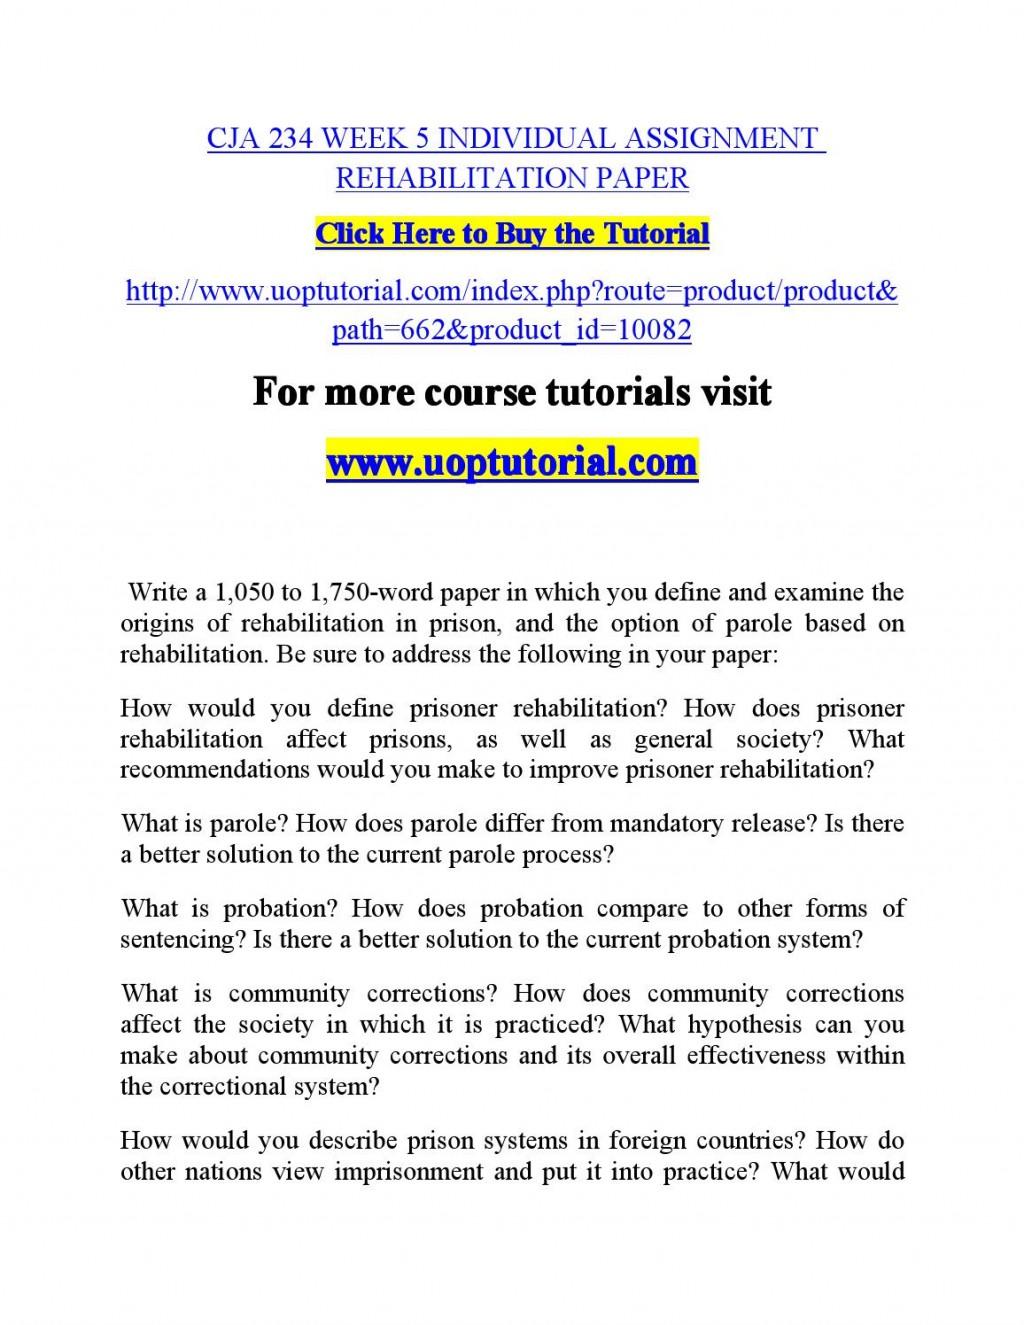 001 Essay Example Punishment Or Rehabilitation Page 1 Awesome Large